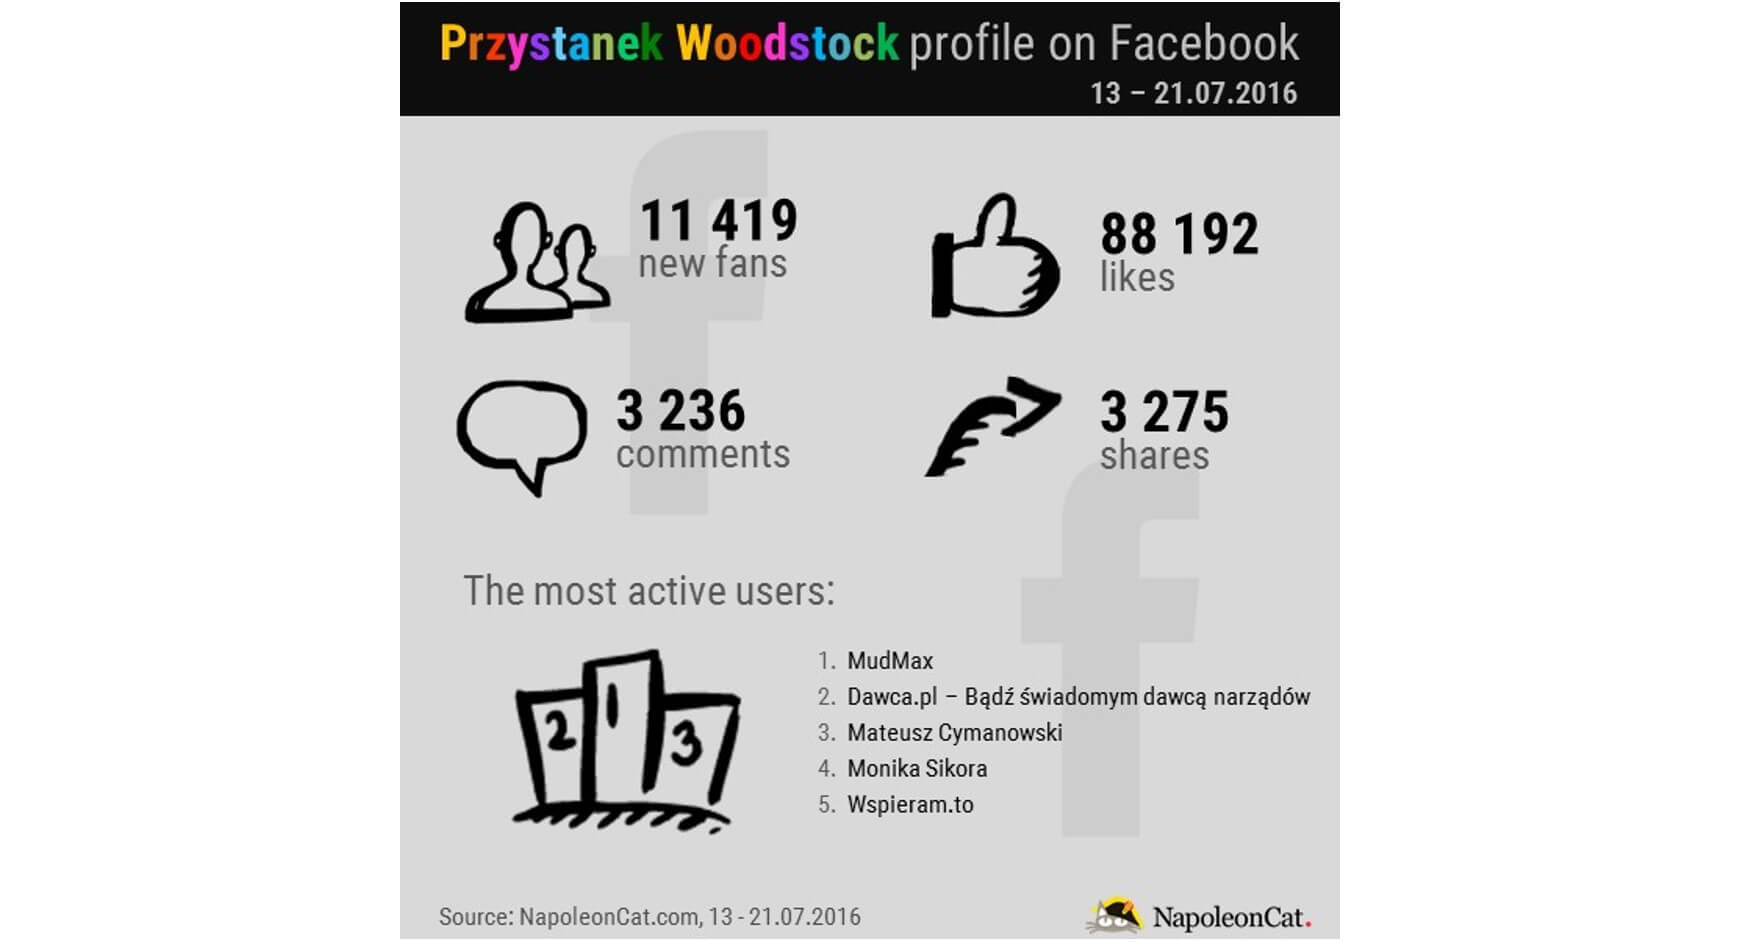 Przystanek Woodstock Facebook profile_NapoleonCat.com blog